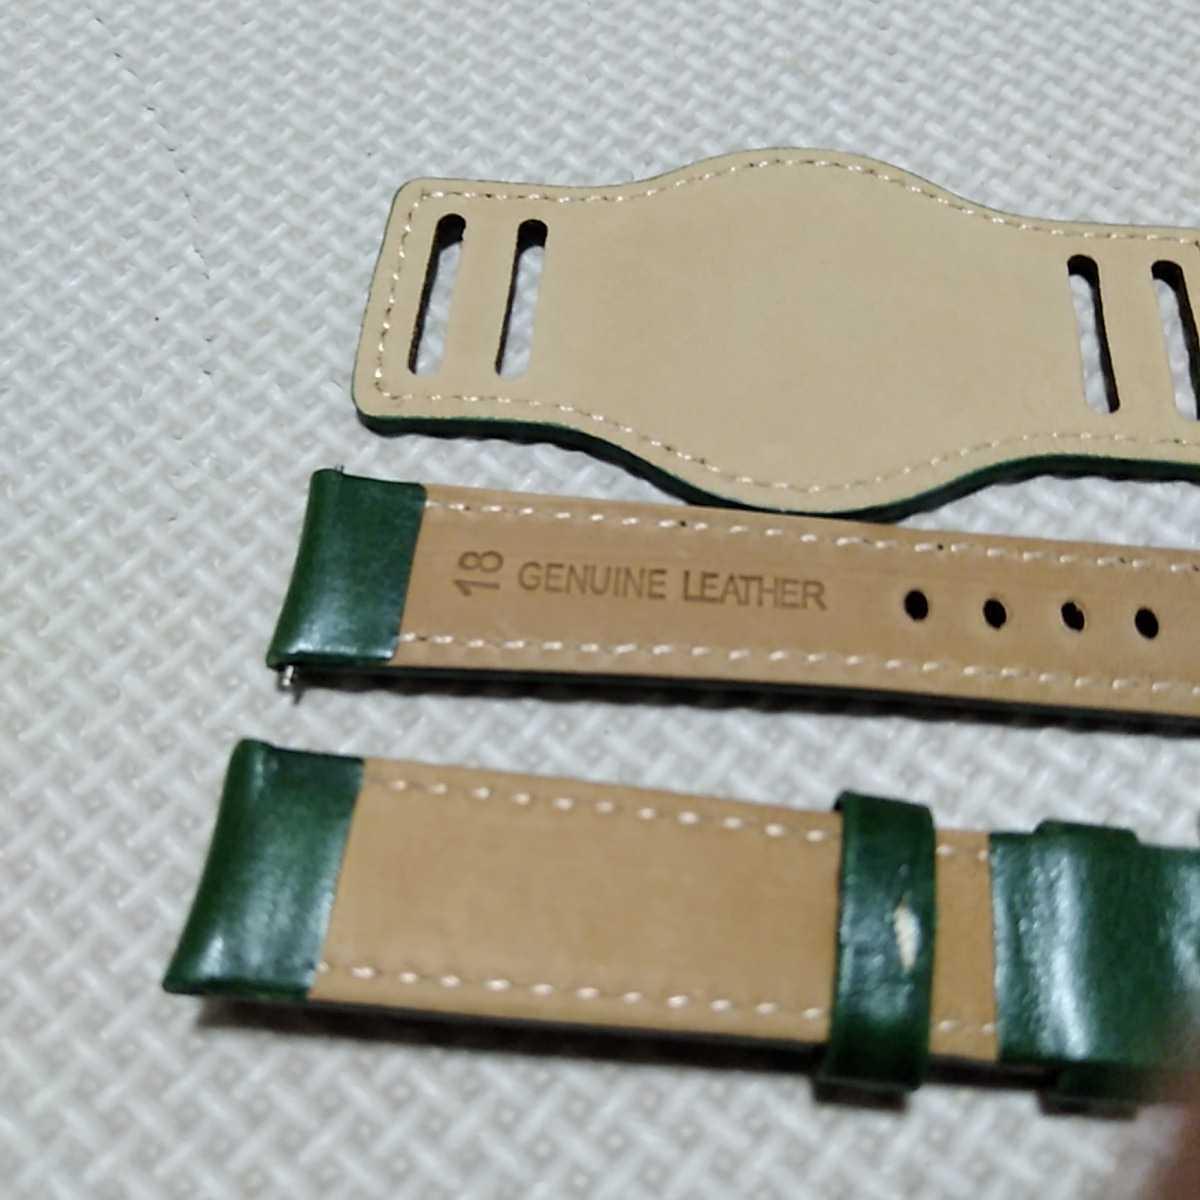 No52 ブンド BUND 本革レザーベルト 腕時計ベルト 交換用ストラップ グリーン 18mm 未使用 高品質 ドイツパイロット 空軍_画像5